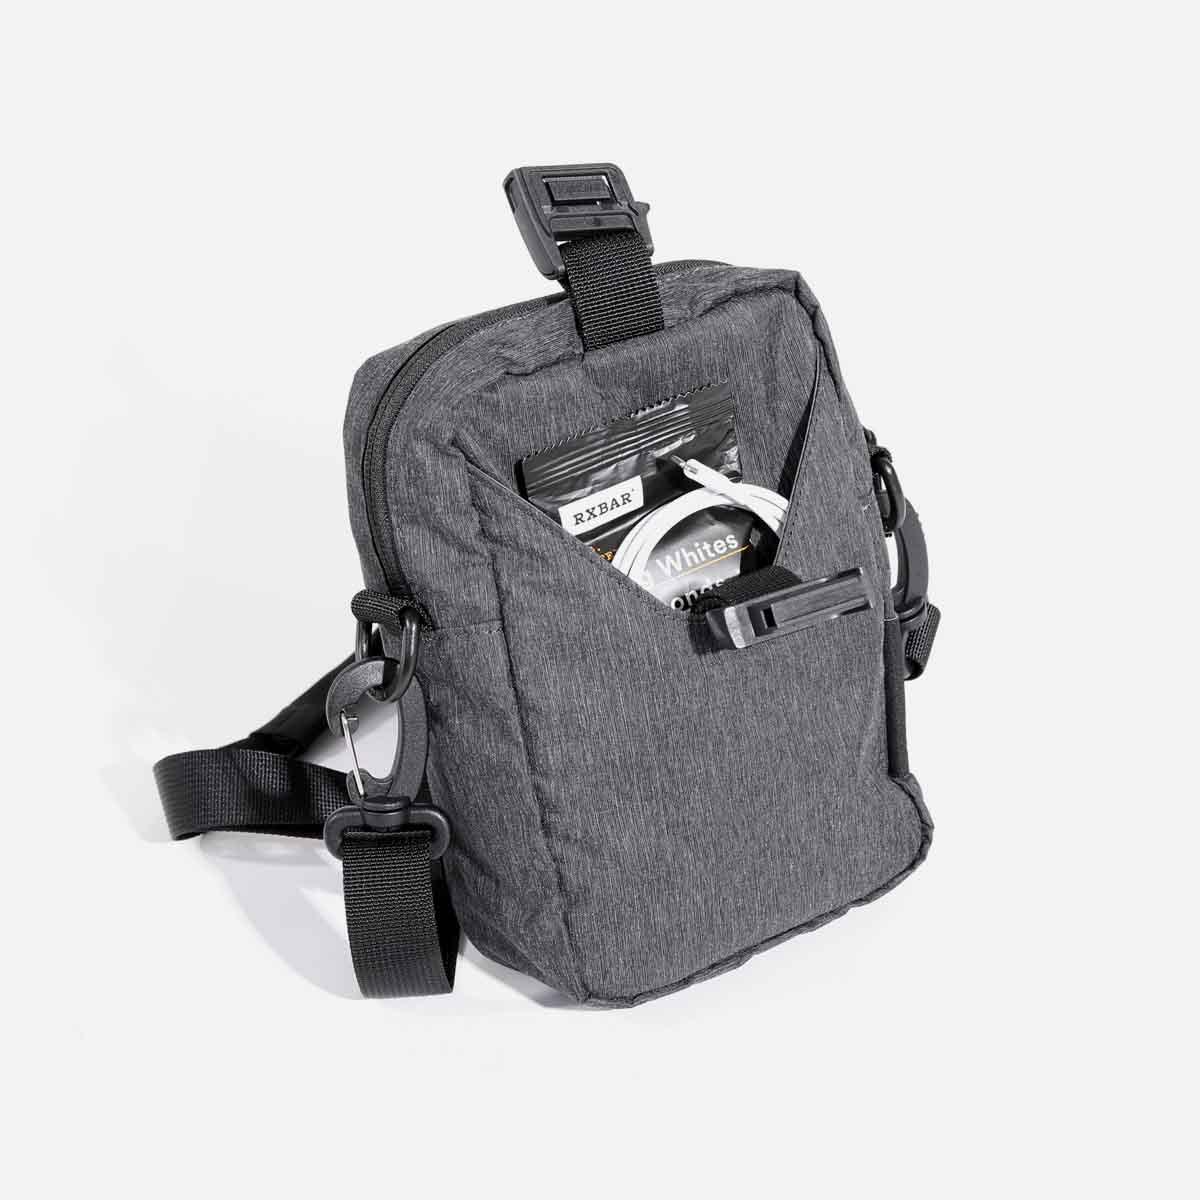 Front stash pocket with Fidlock® magnetic fastener for secure storage.